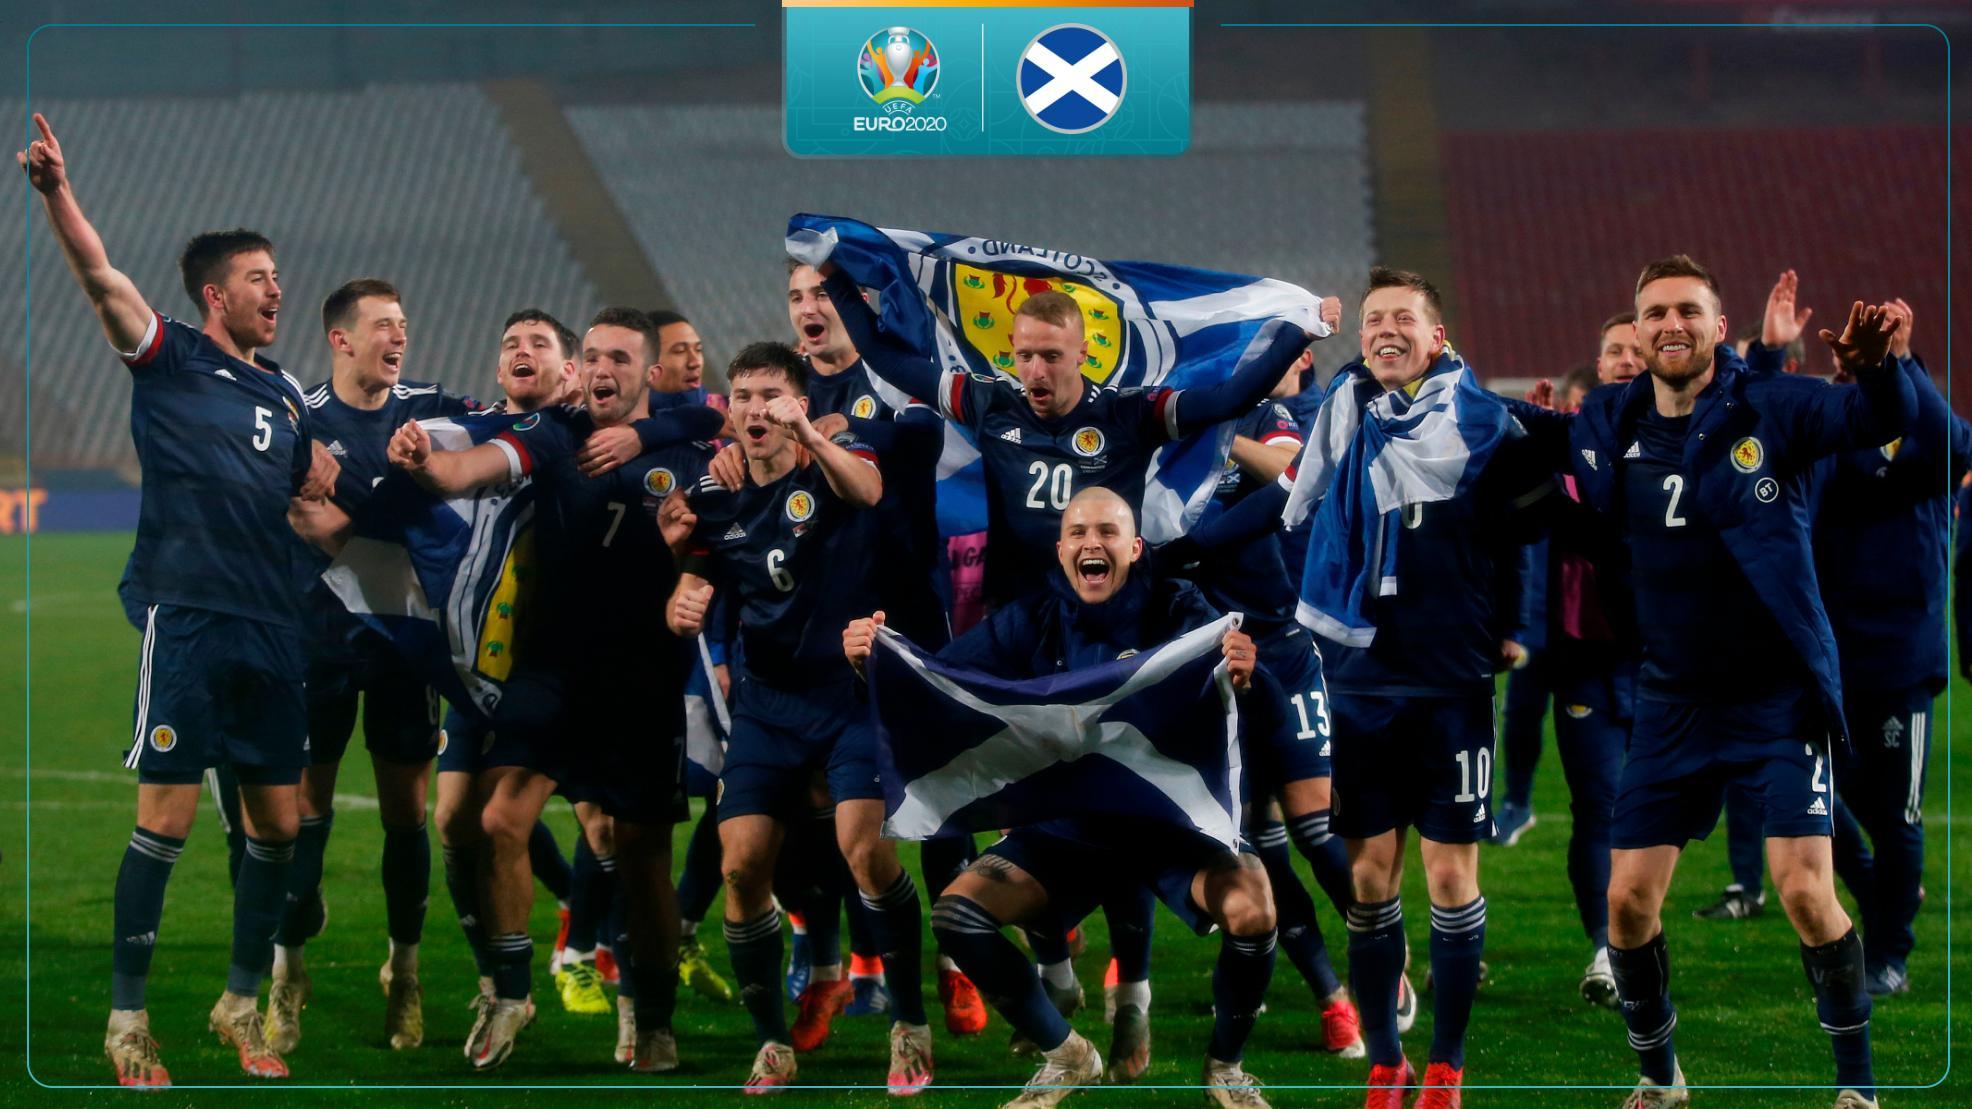 Участники ЕВРО-2020: Шотландия | ЕВРО-2020 | UEFA.com